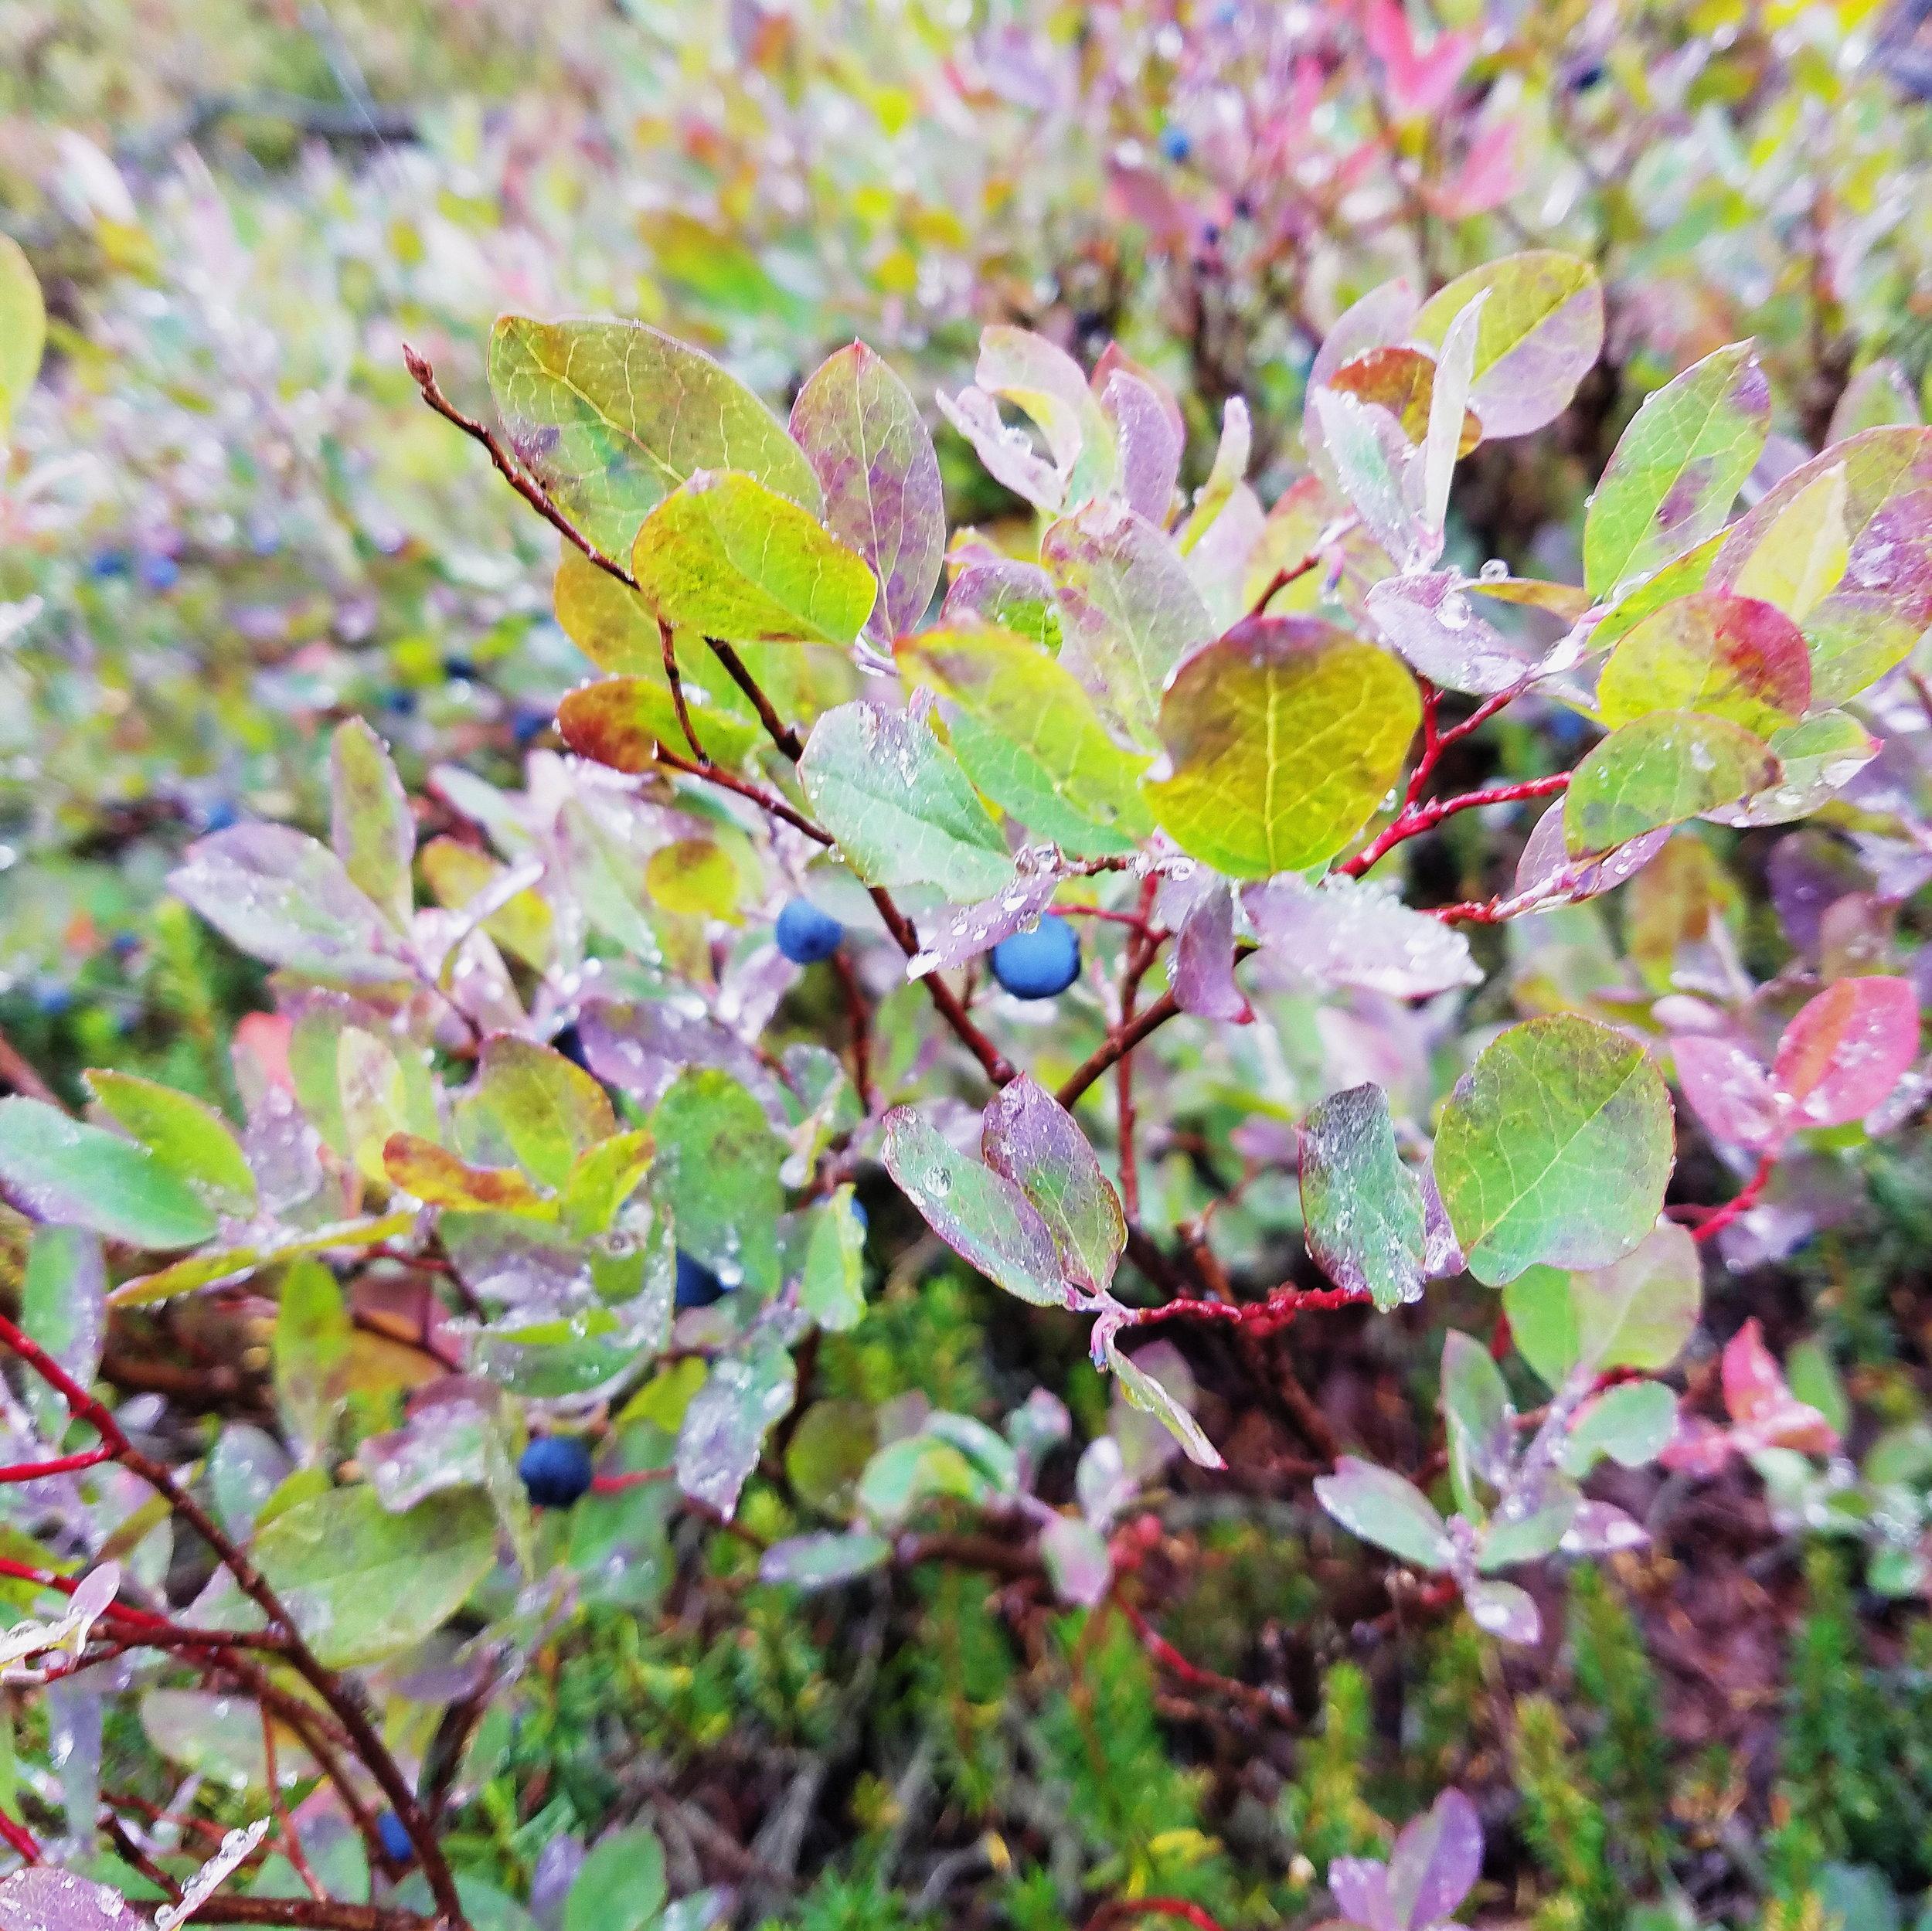 Mt Baker blueberries - my all time favorite!